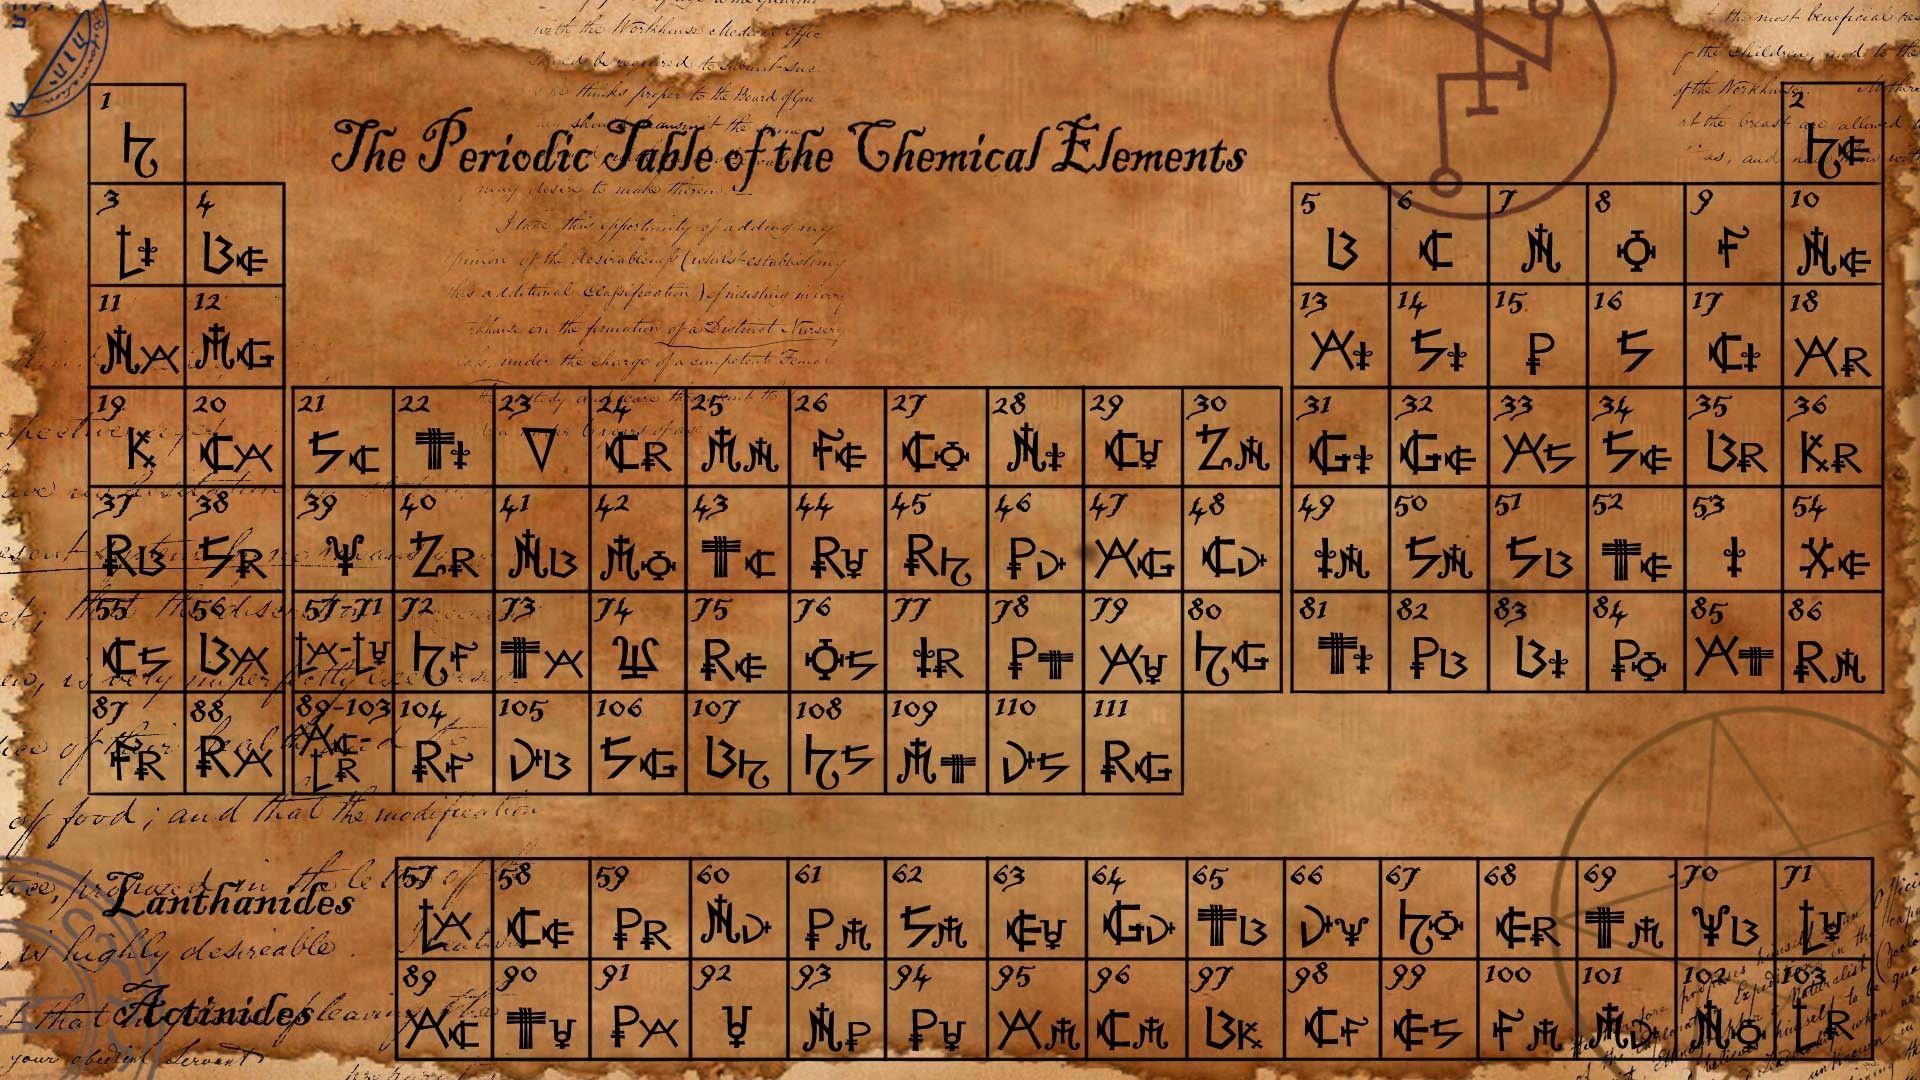 Numere atomice